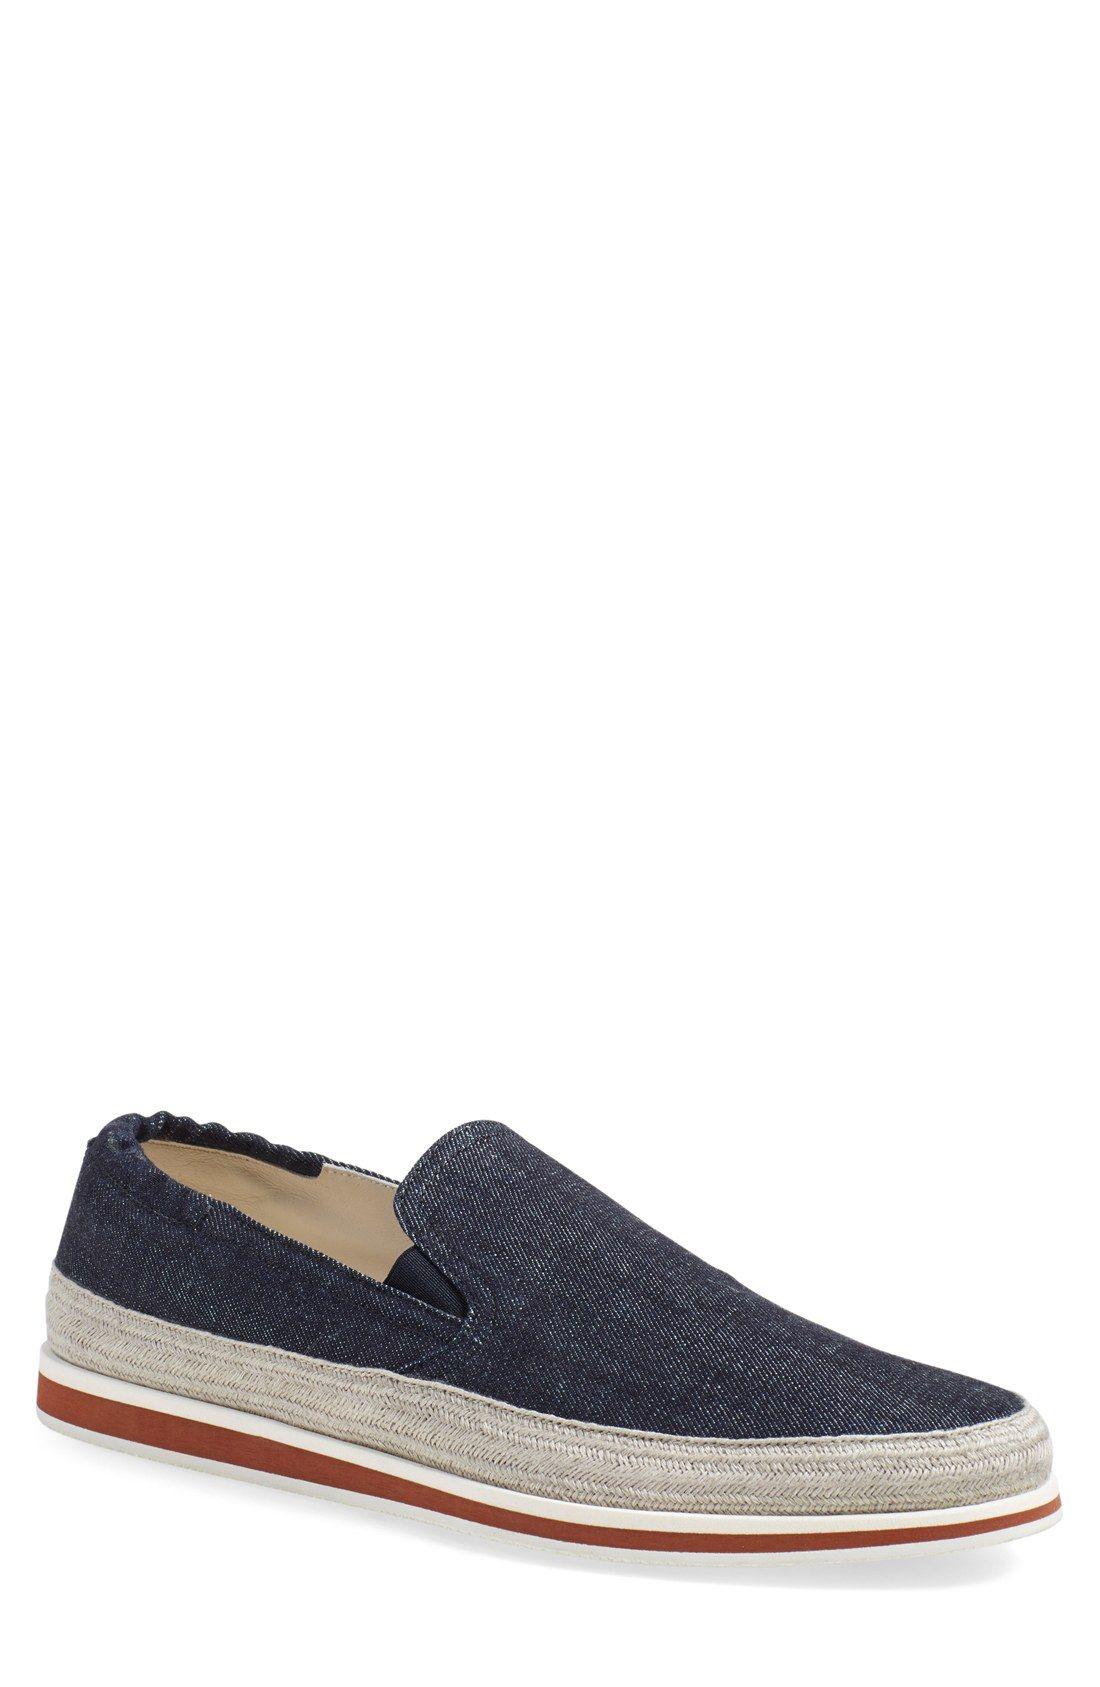 19351dac Prada 'St. Tropez' Espadrille (Men)   Mens Footwear   Espadrilles ...